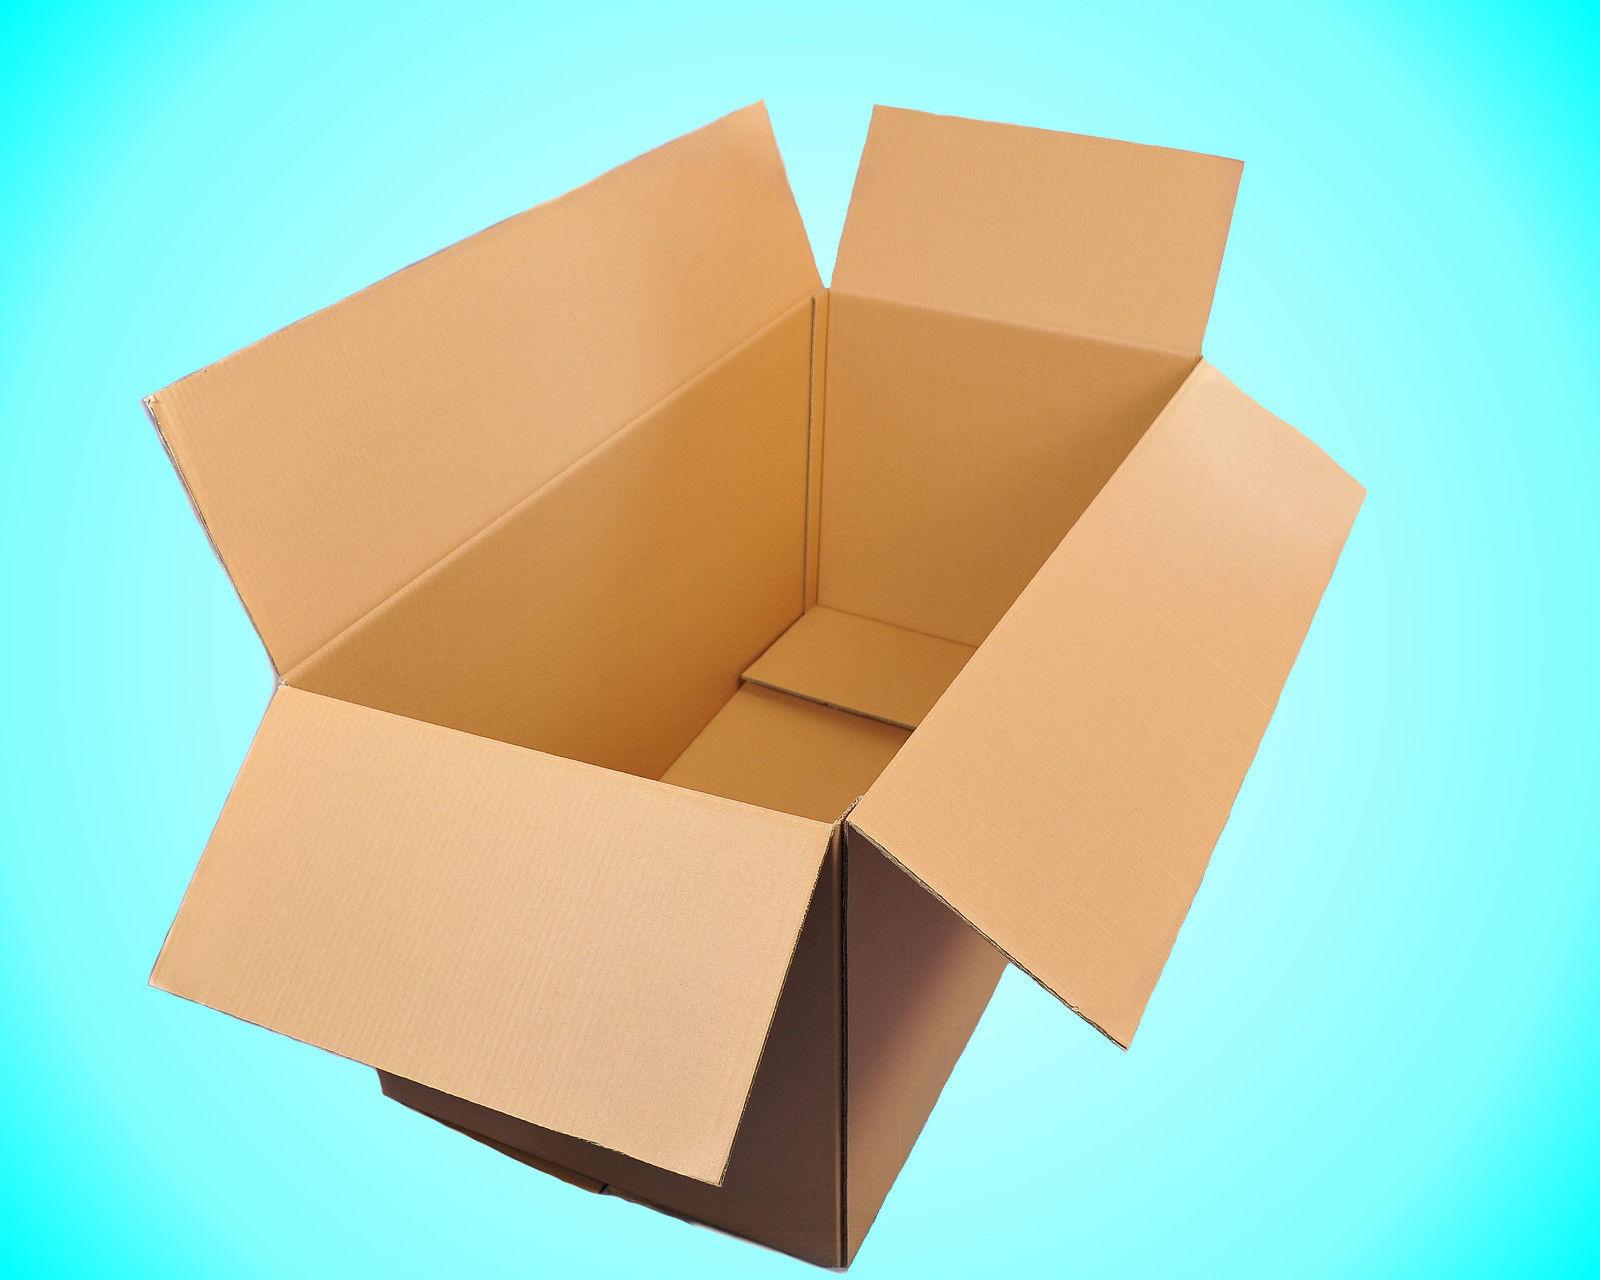 1200x600x600 karton faltkartons versandkarton 120x60x60 2 wellig dhl paket neu ebay. Black Bedroom Furniture Sets. Home Design Ideas